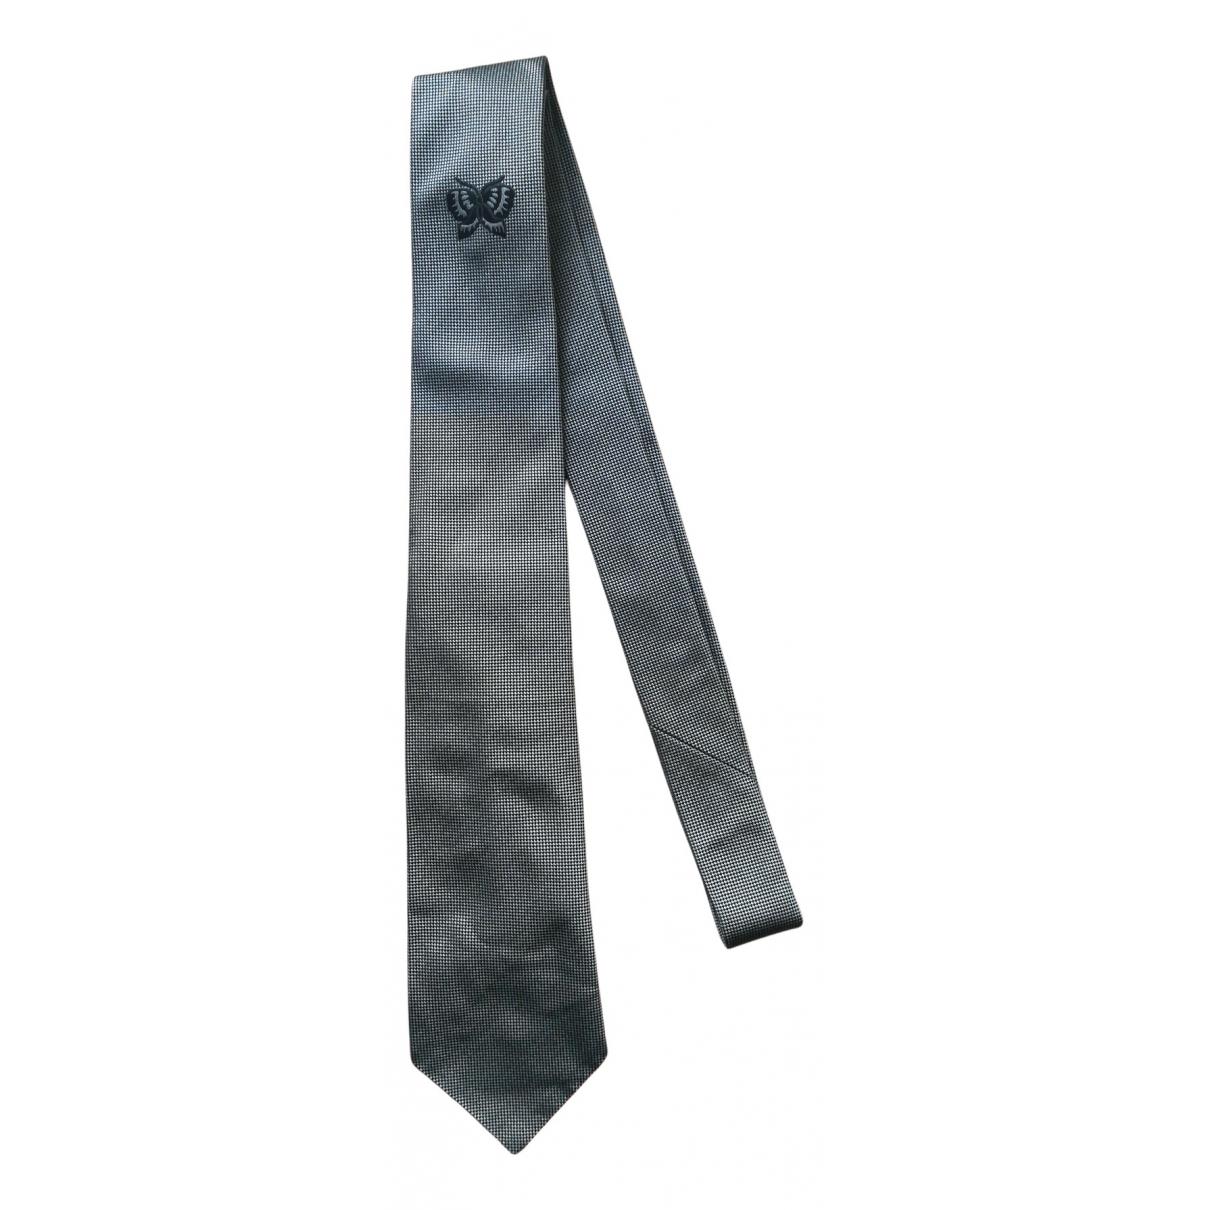 Bottega Veneta - Cravates   pour homme en soie - bleu